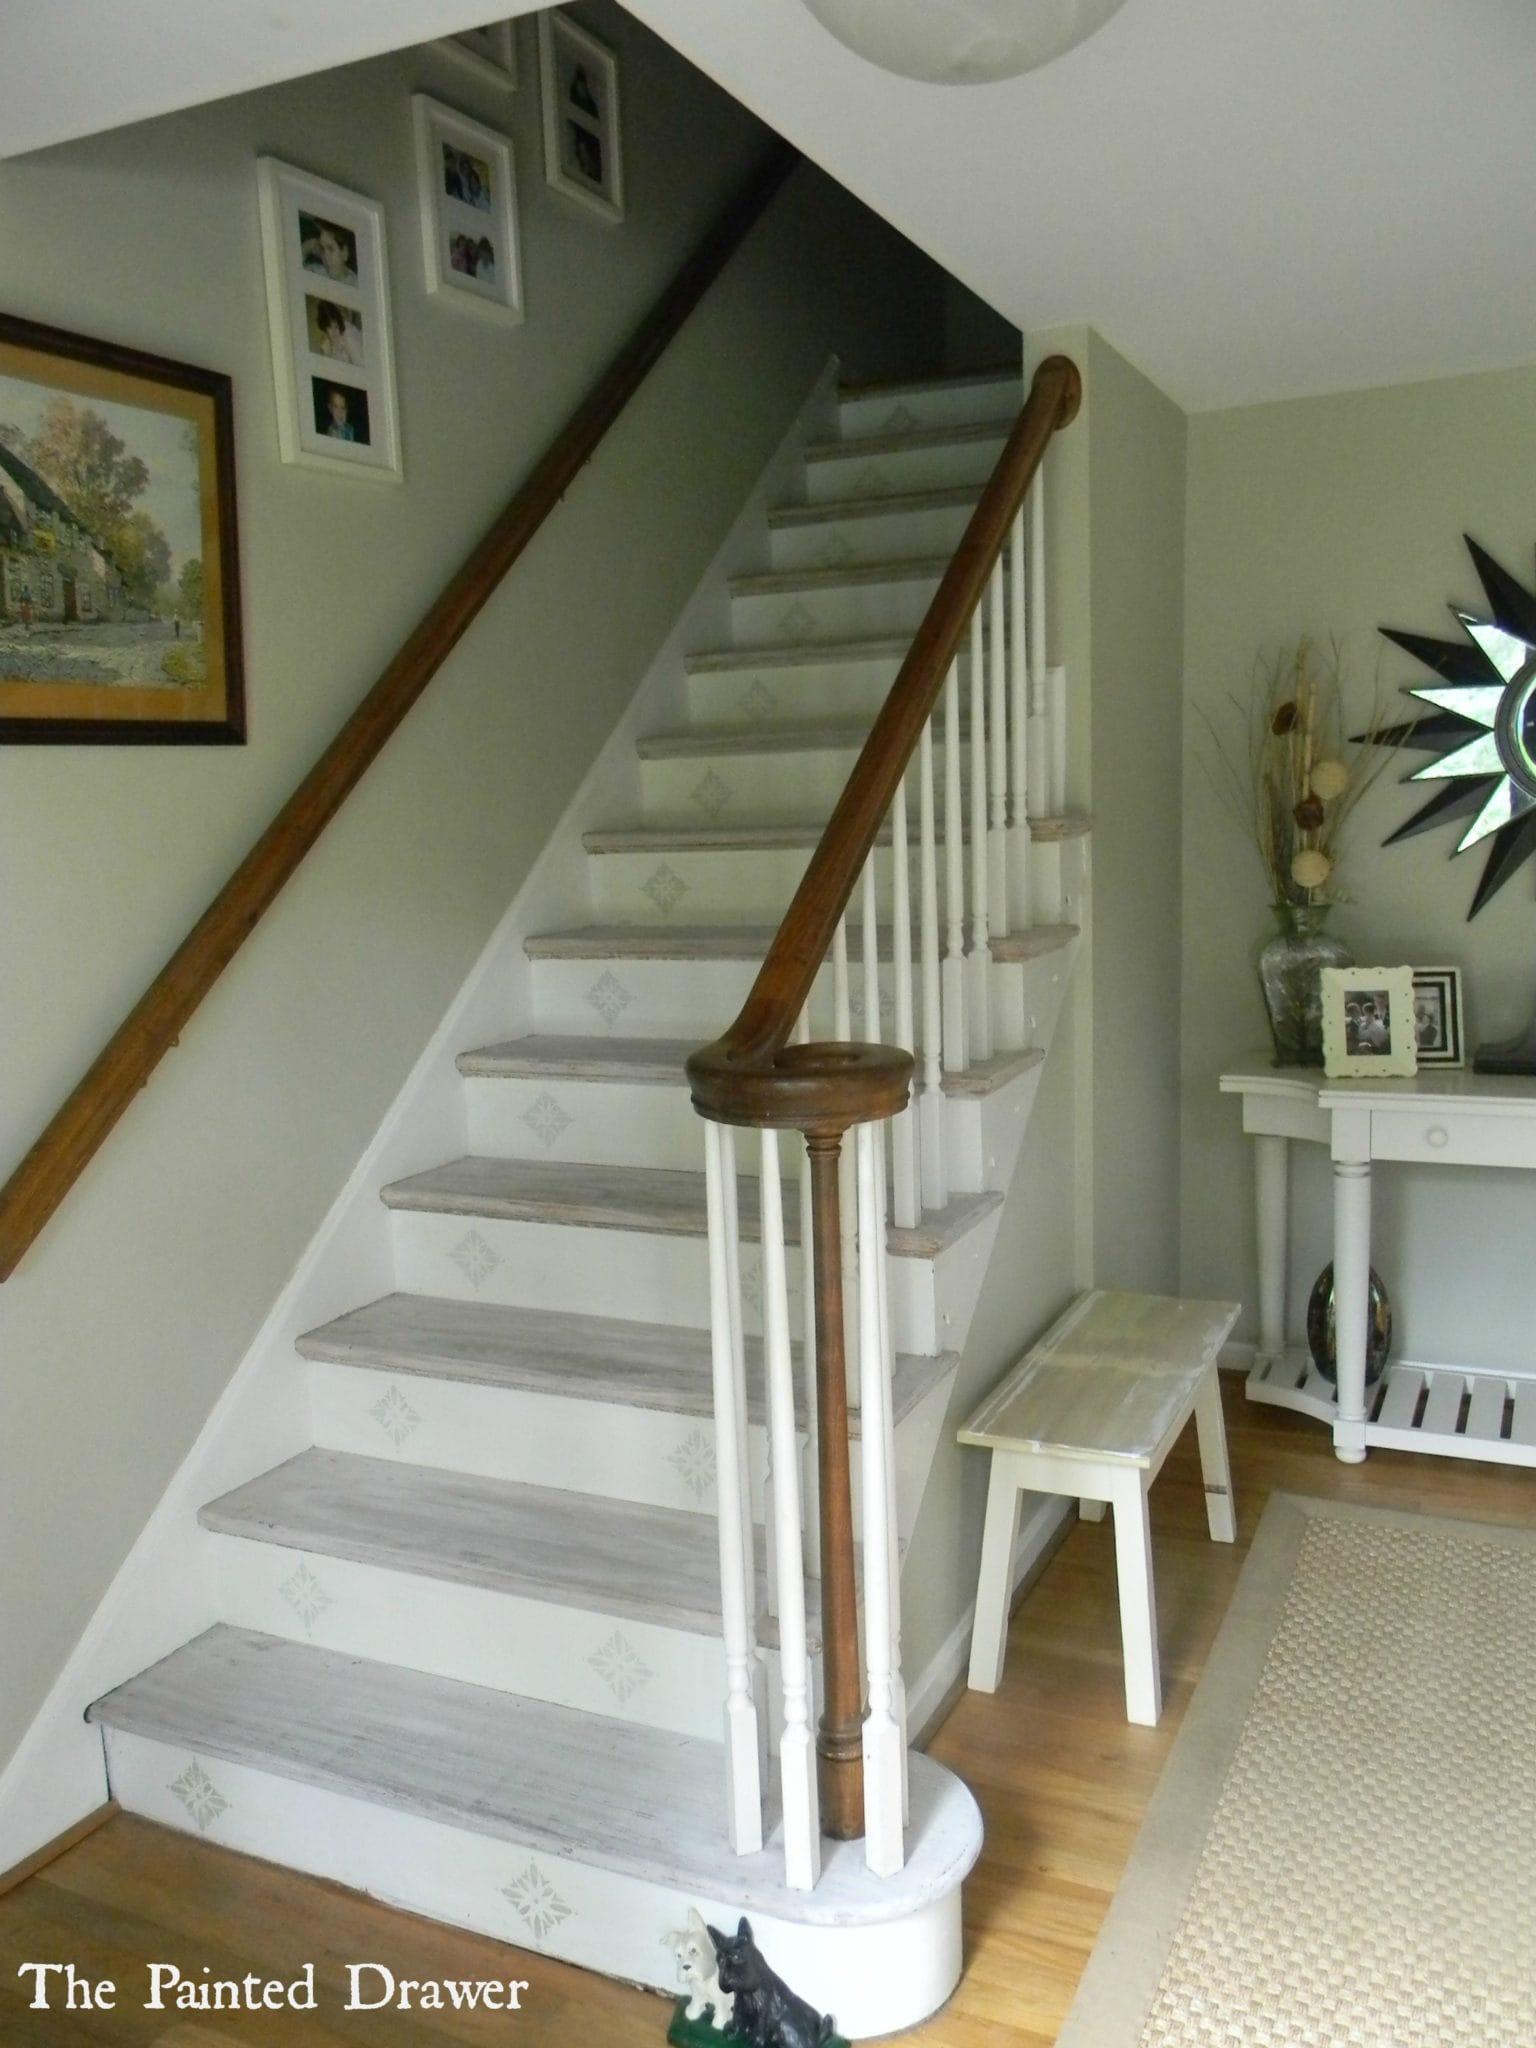 Whitewashed Stairs At Www.thepainteddrawer.com ...